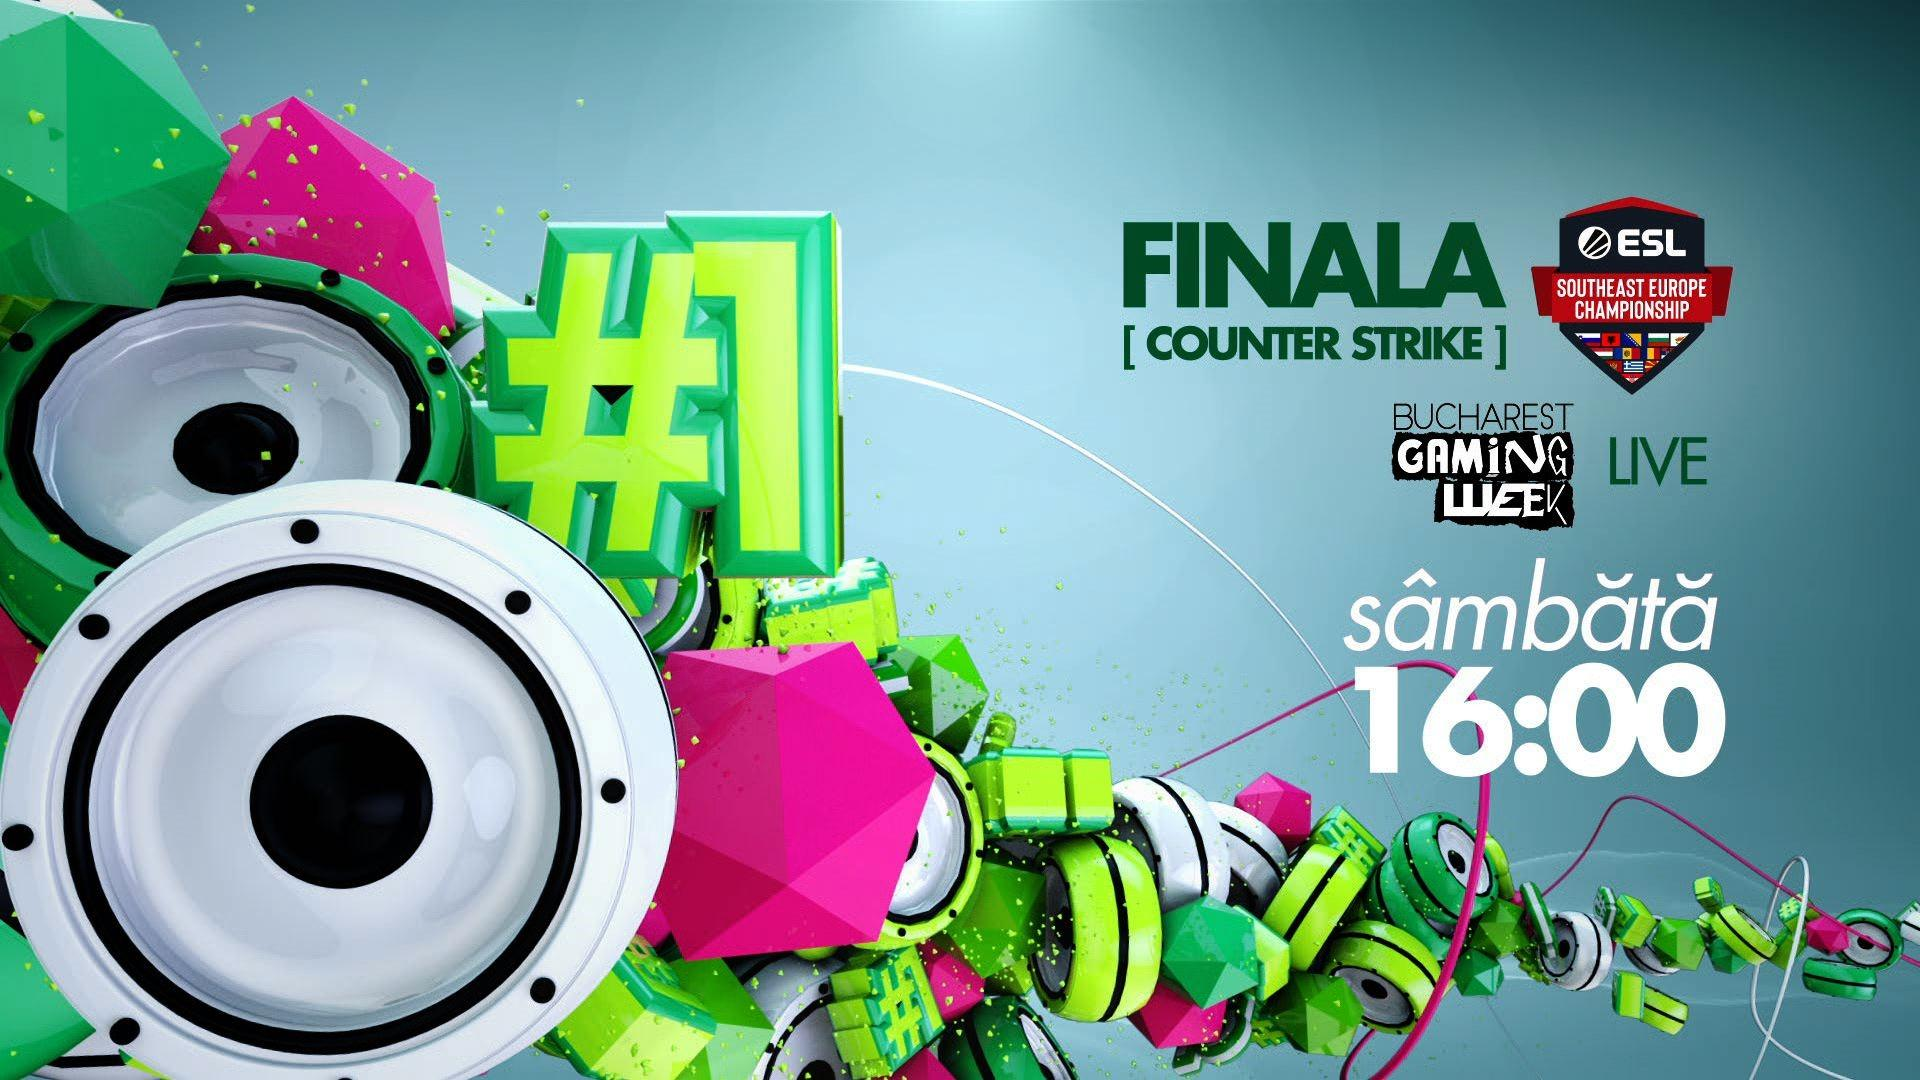 ZU TV transmite live finala ESL Southeast Europe Championship la Counter Strike